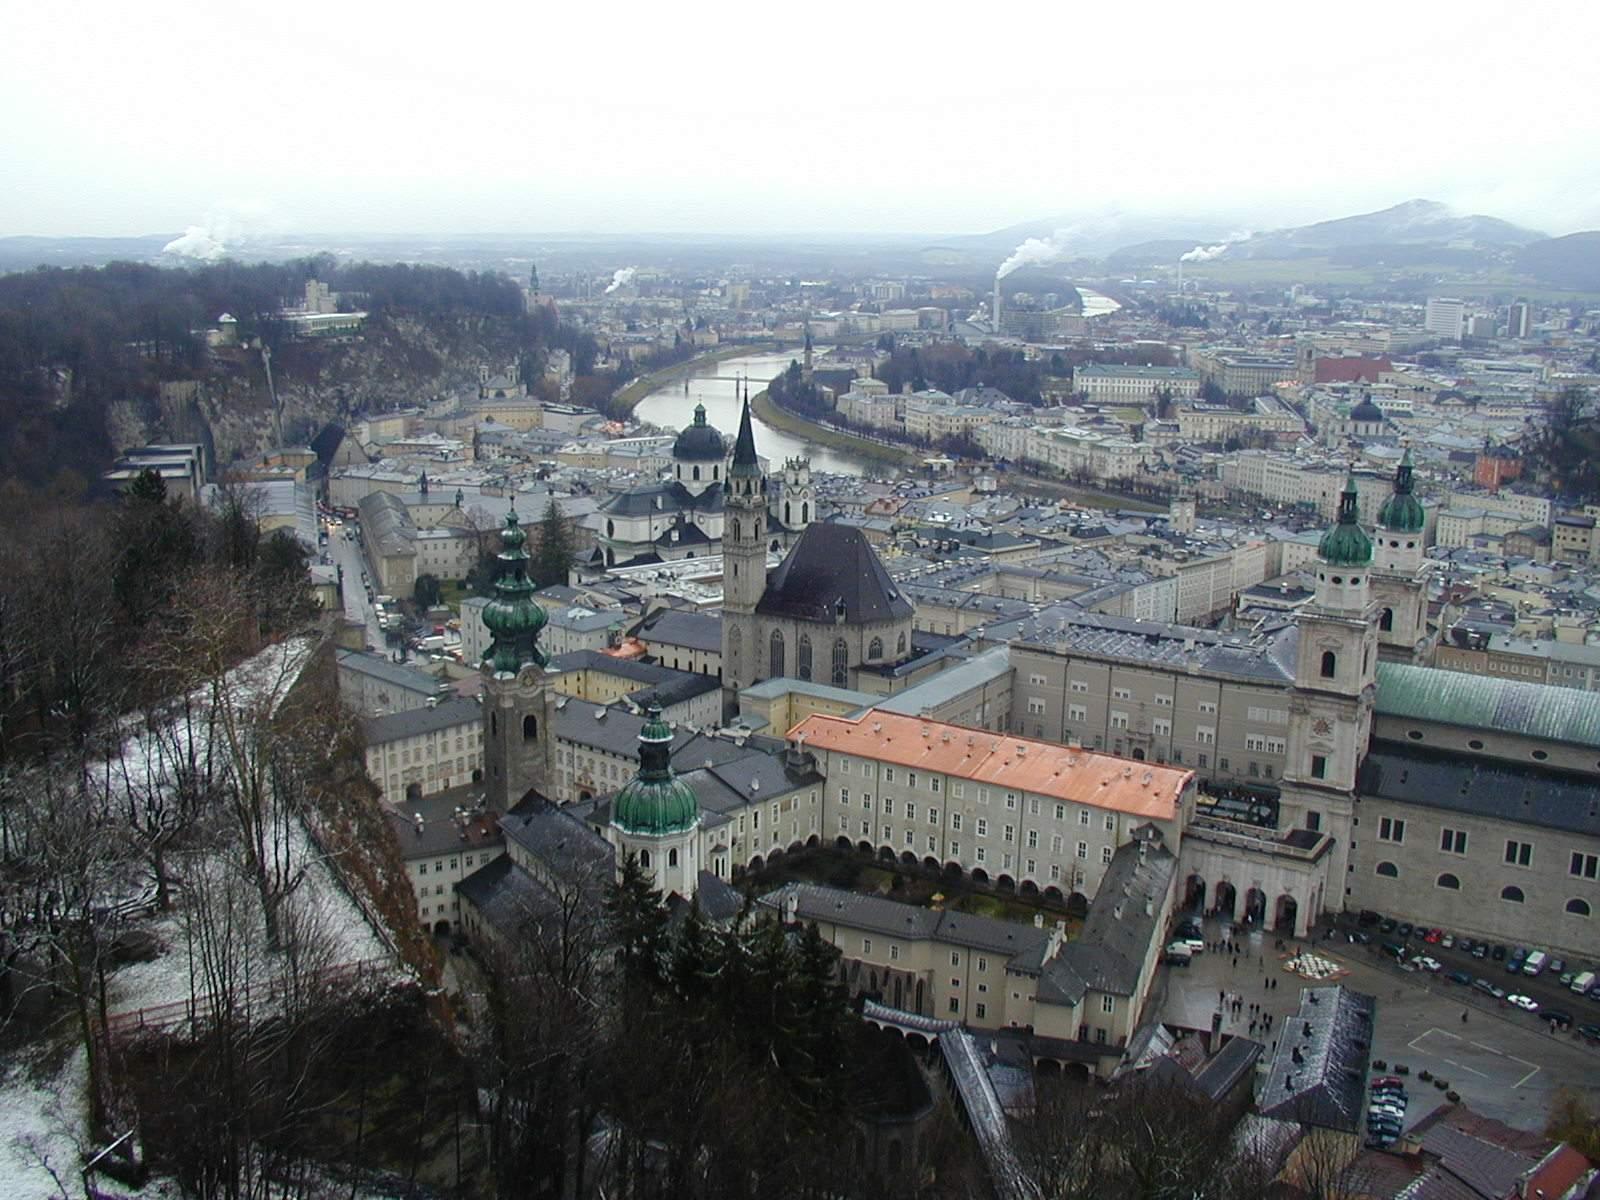 Free Salzburg panorama Stock Photo - FreeImages.com